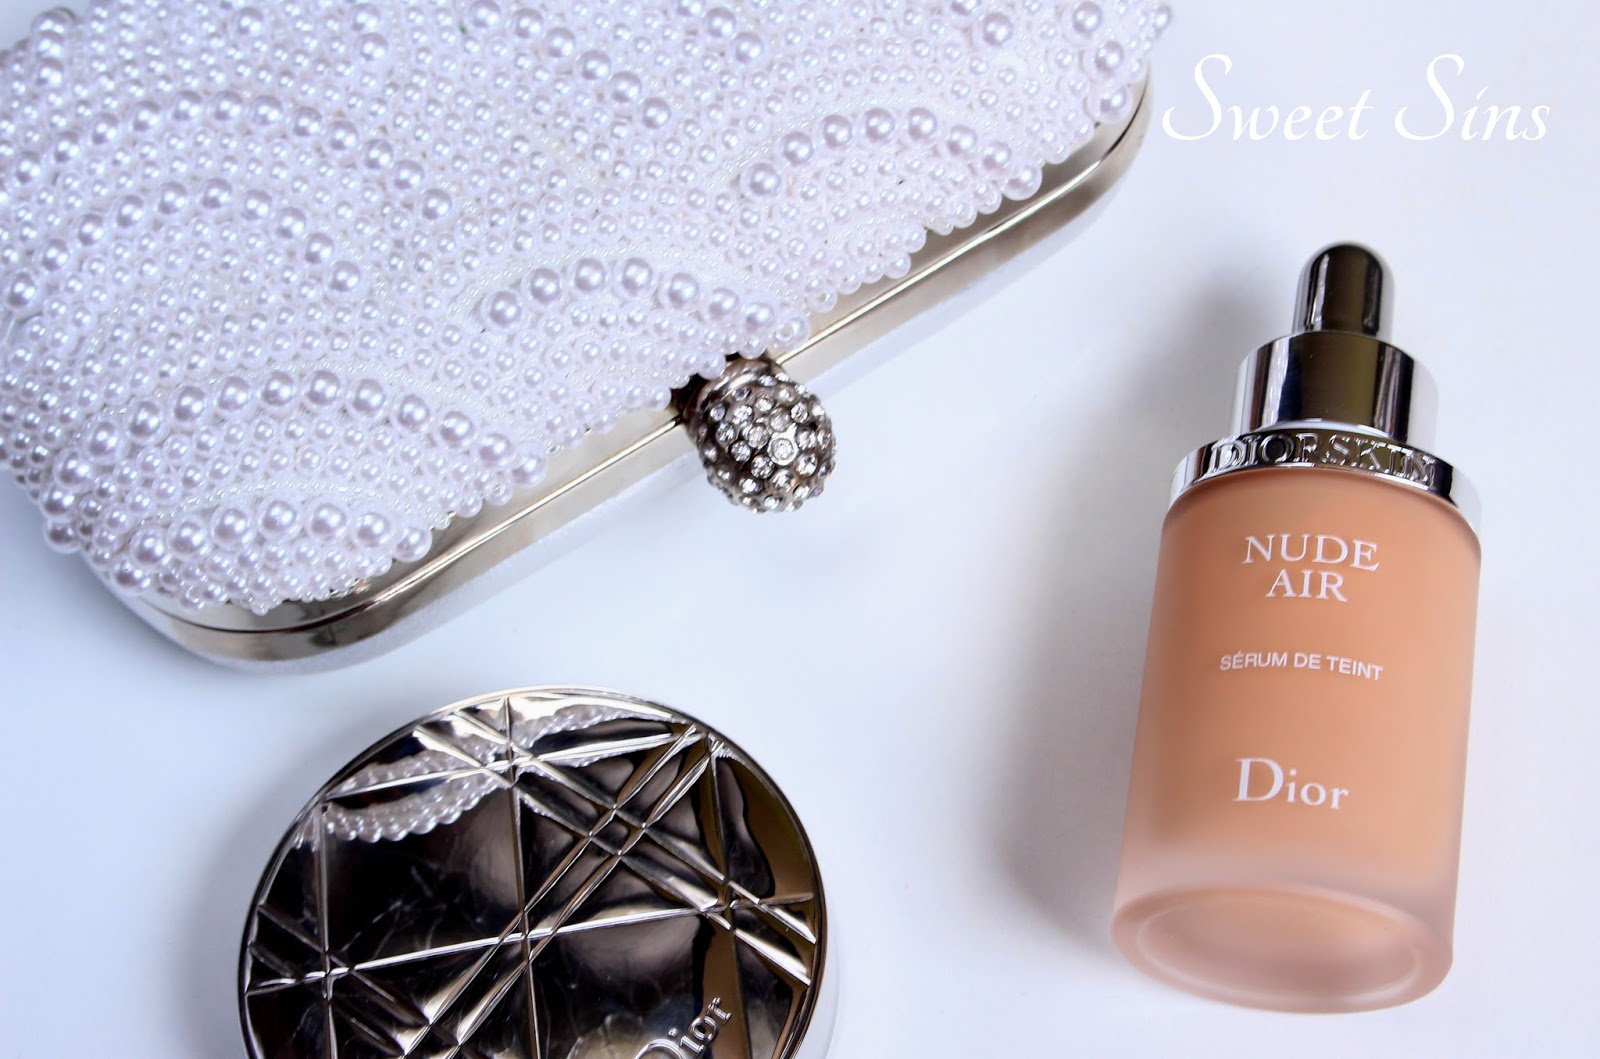 sweet sins diorskin nude air serum 020 recenzja demo. Black Bedroom Furniture Sets. Home Design Ideas